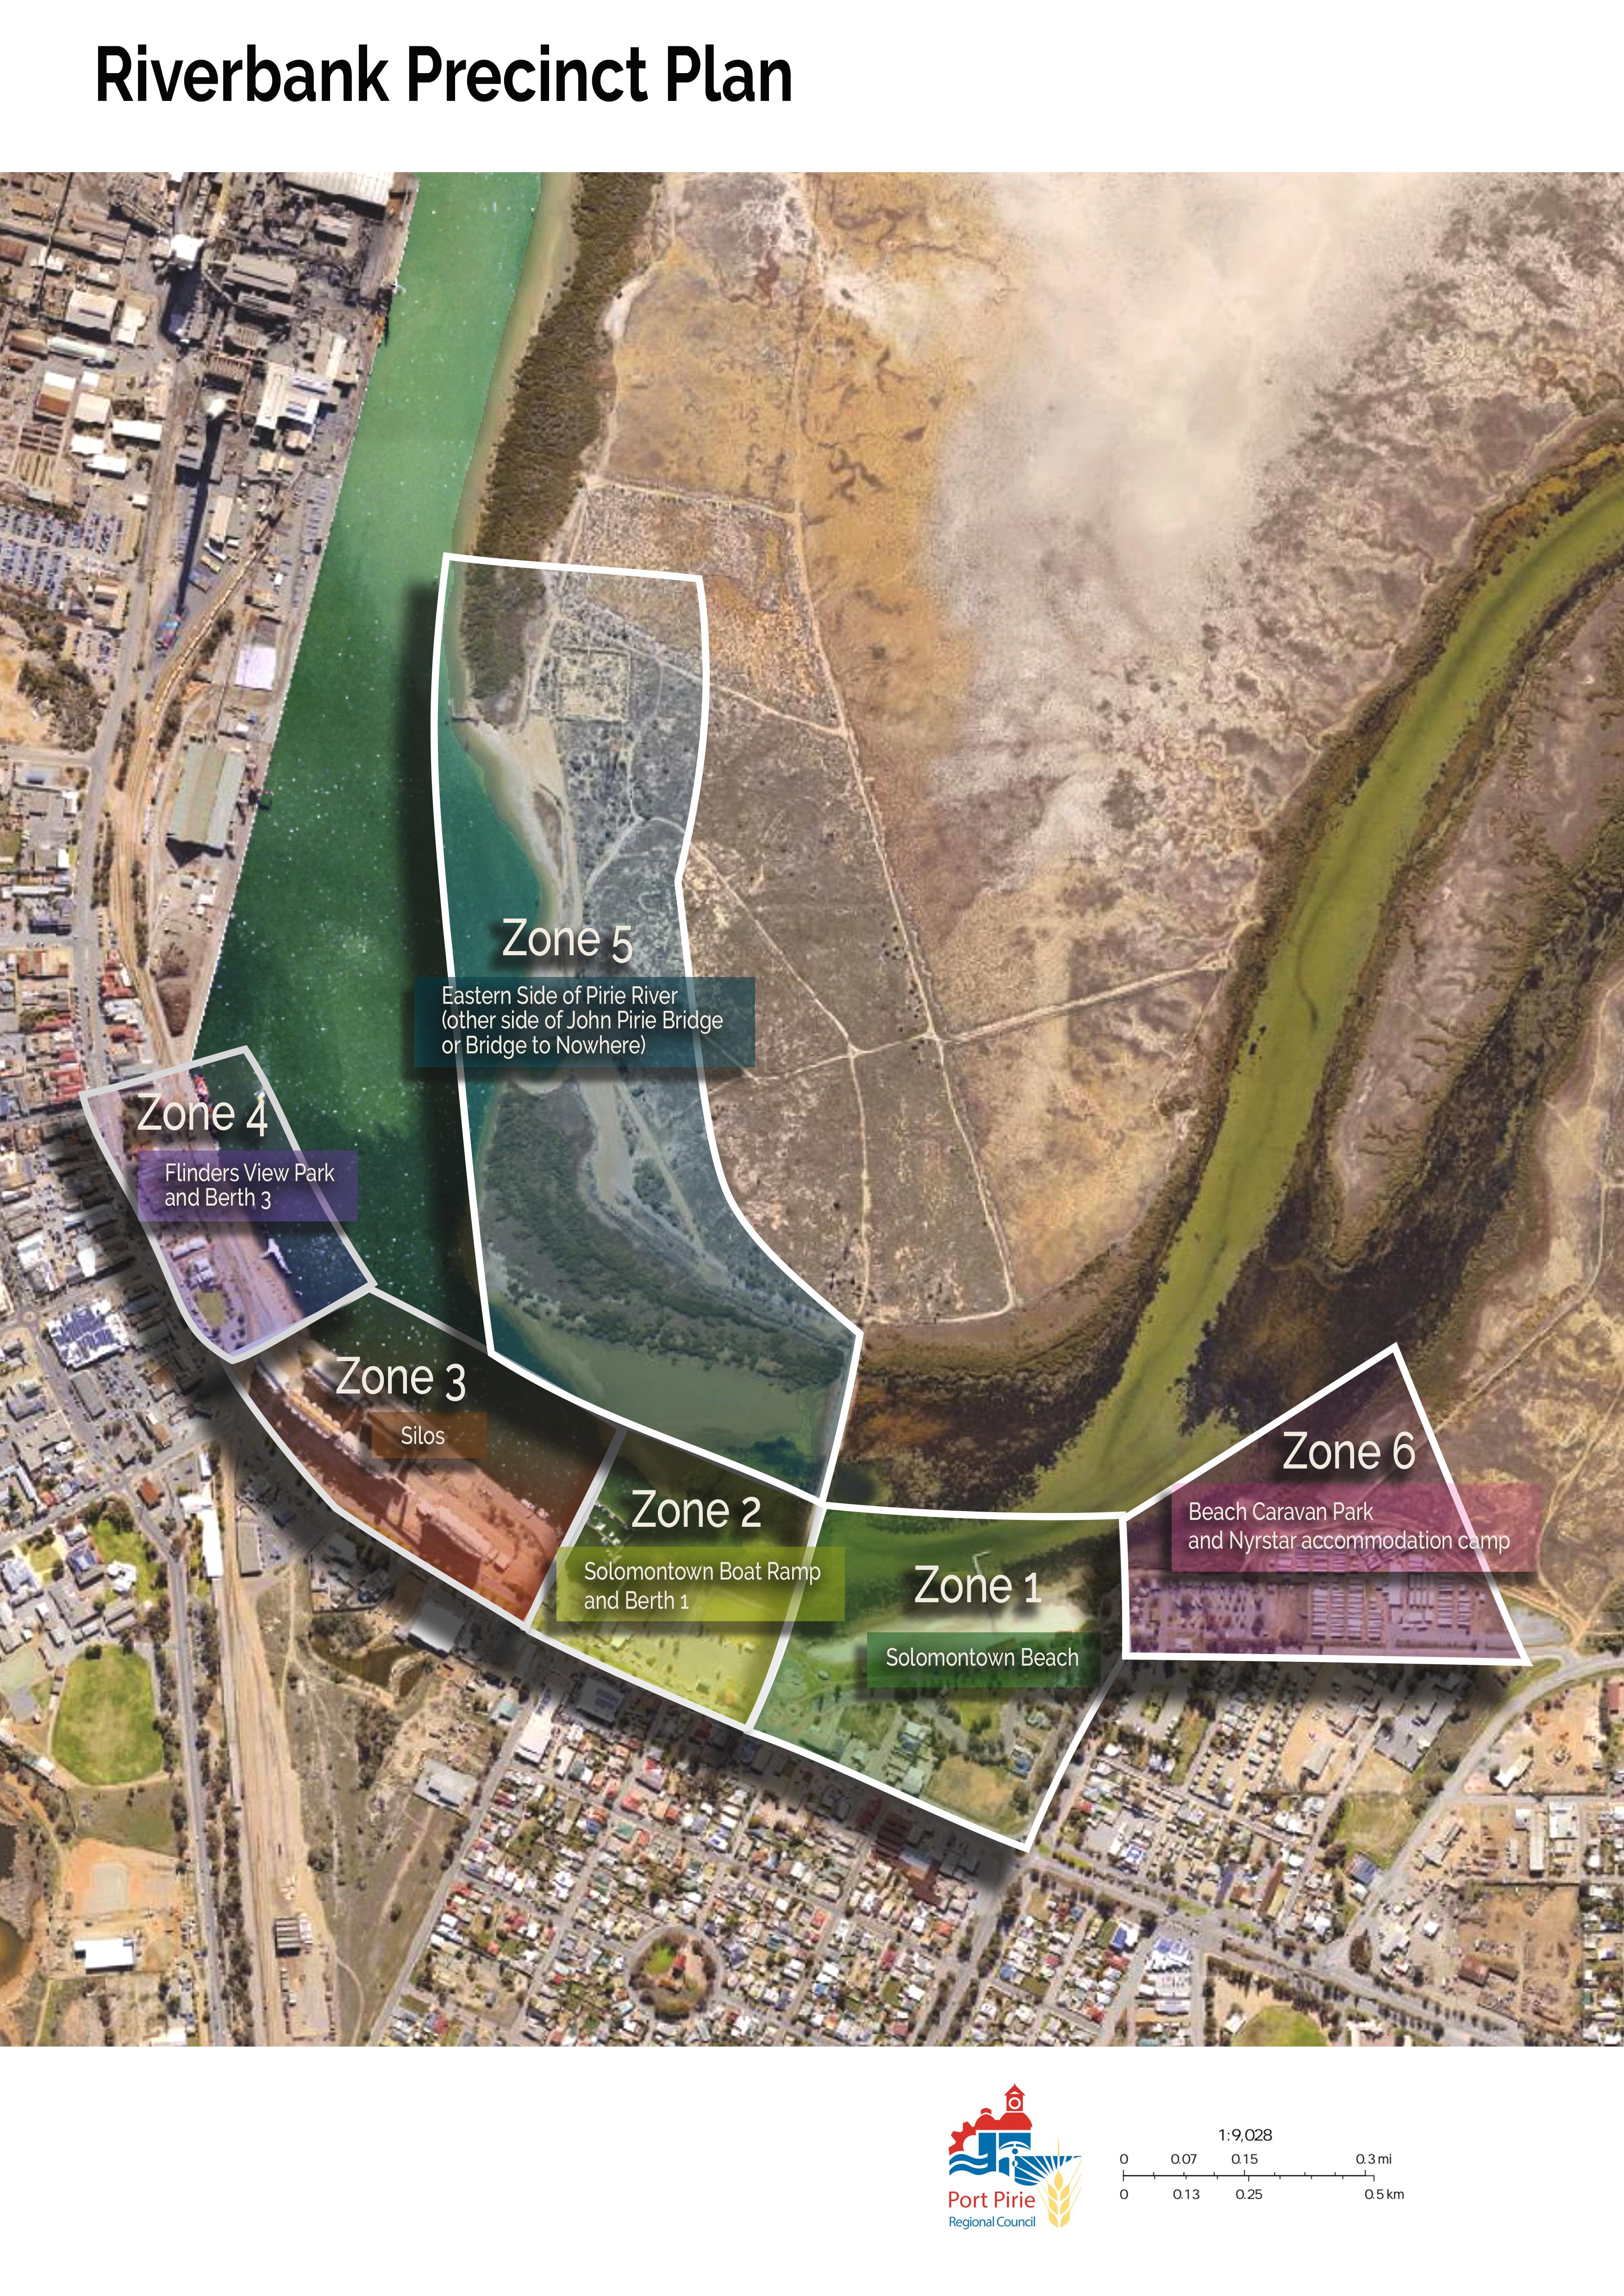 Riverbank Precinct Map